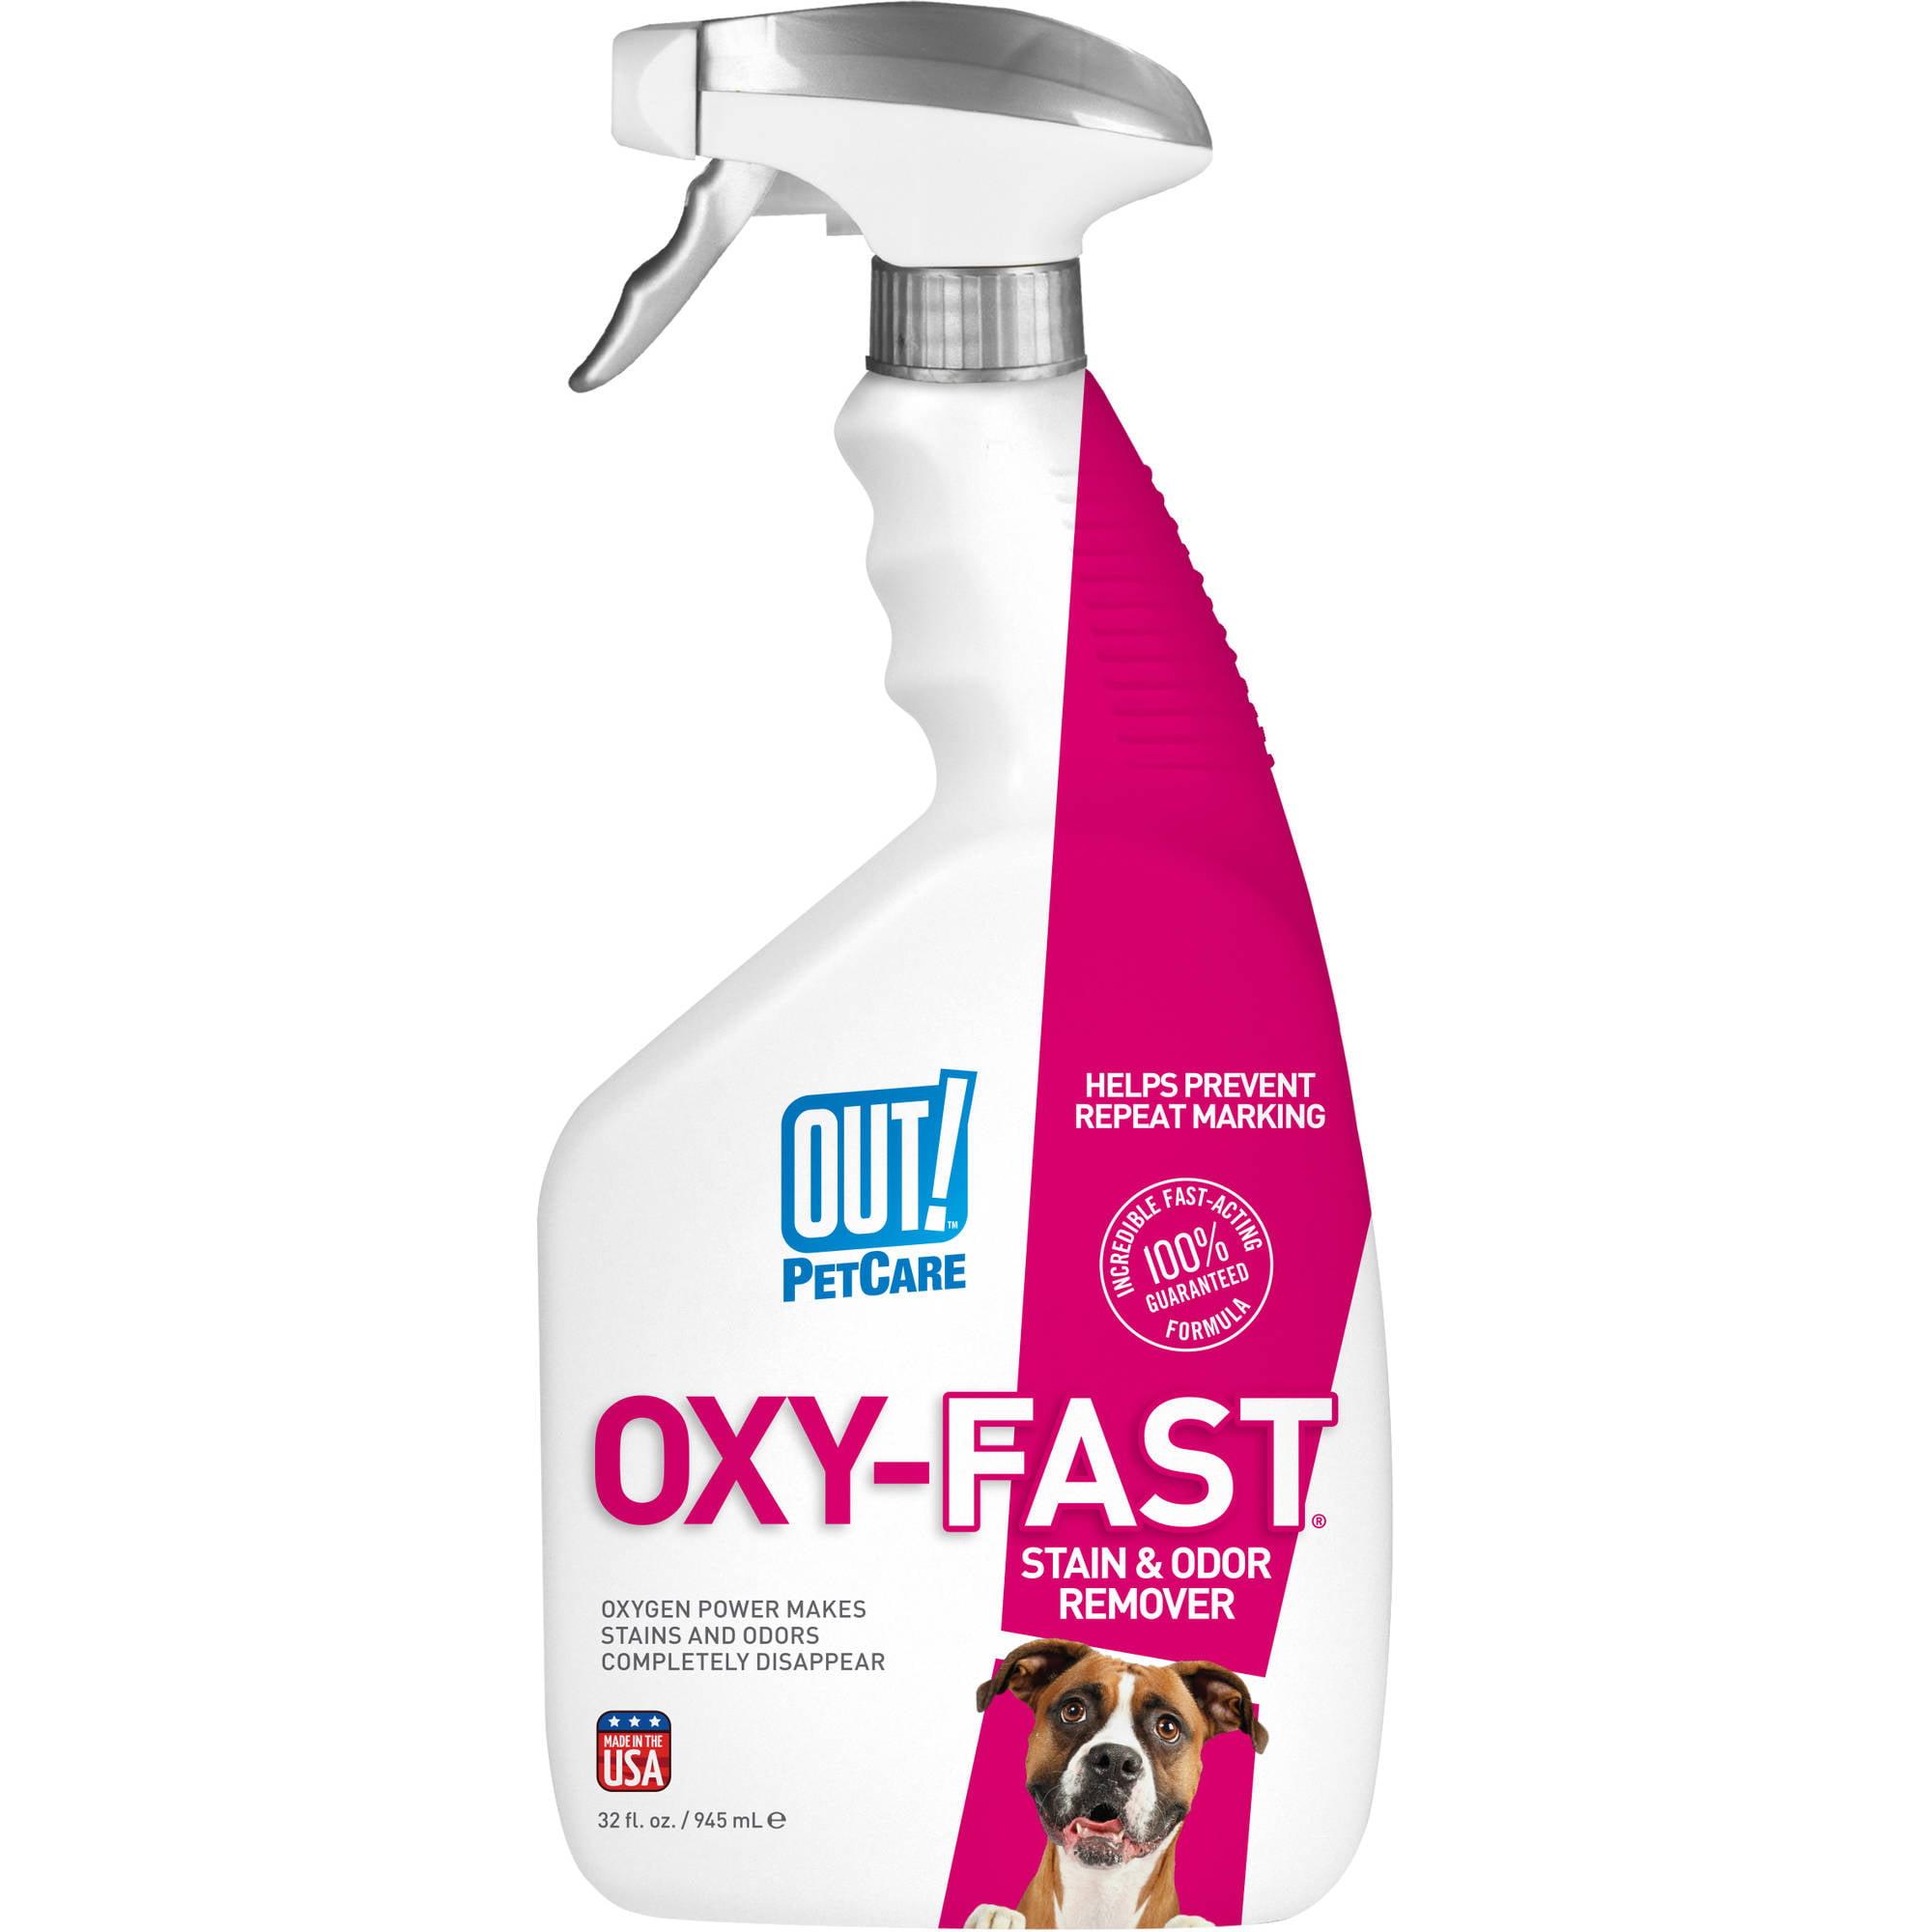 OUT! Oxy Stain & Odor Remover Spray, 32 oz